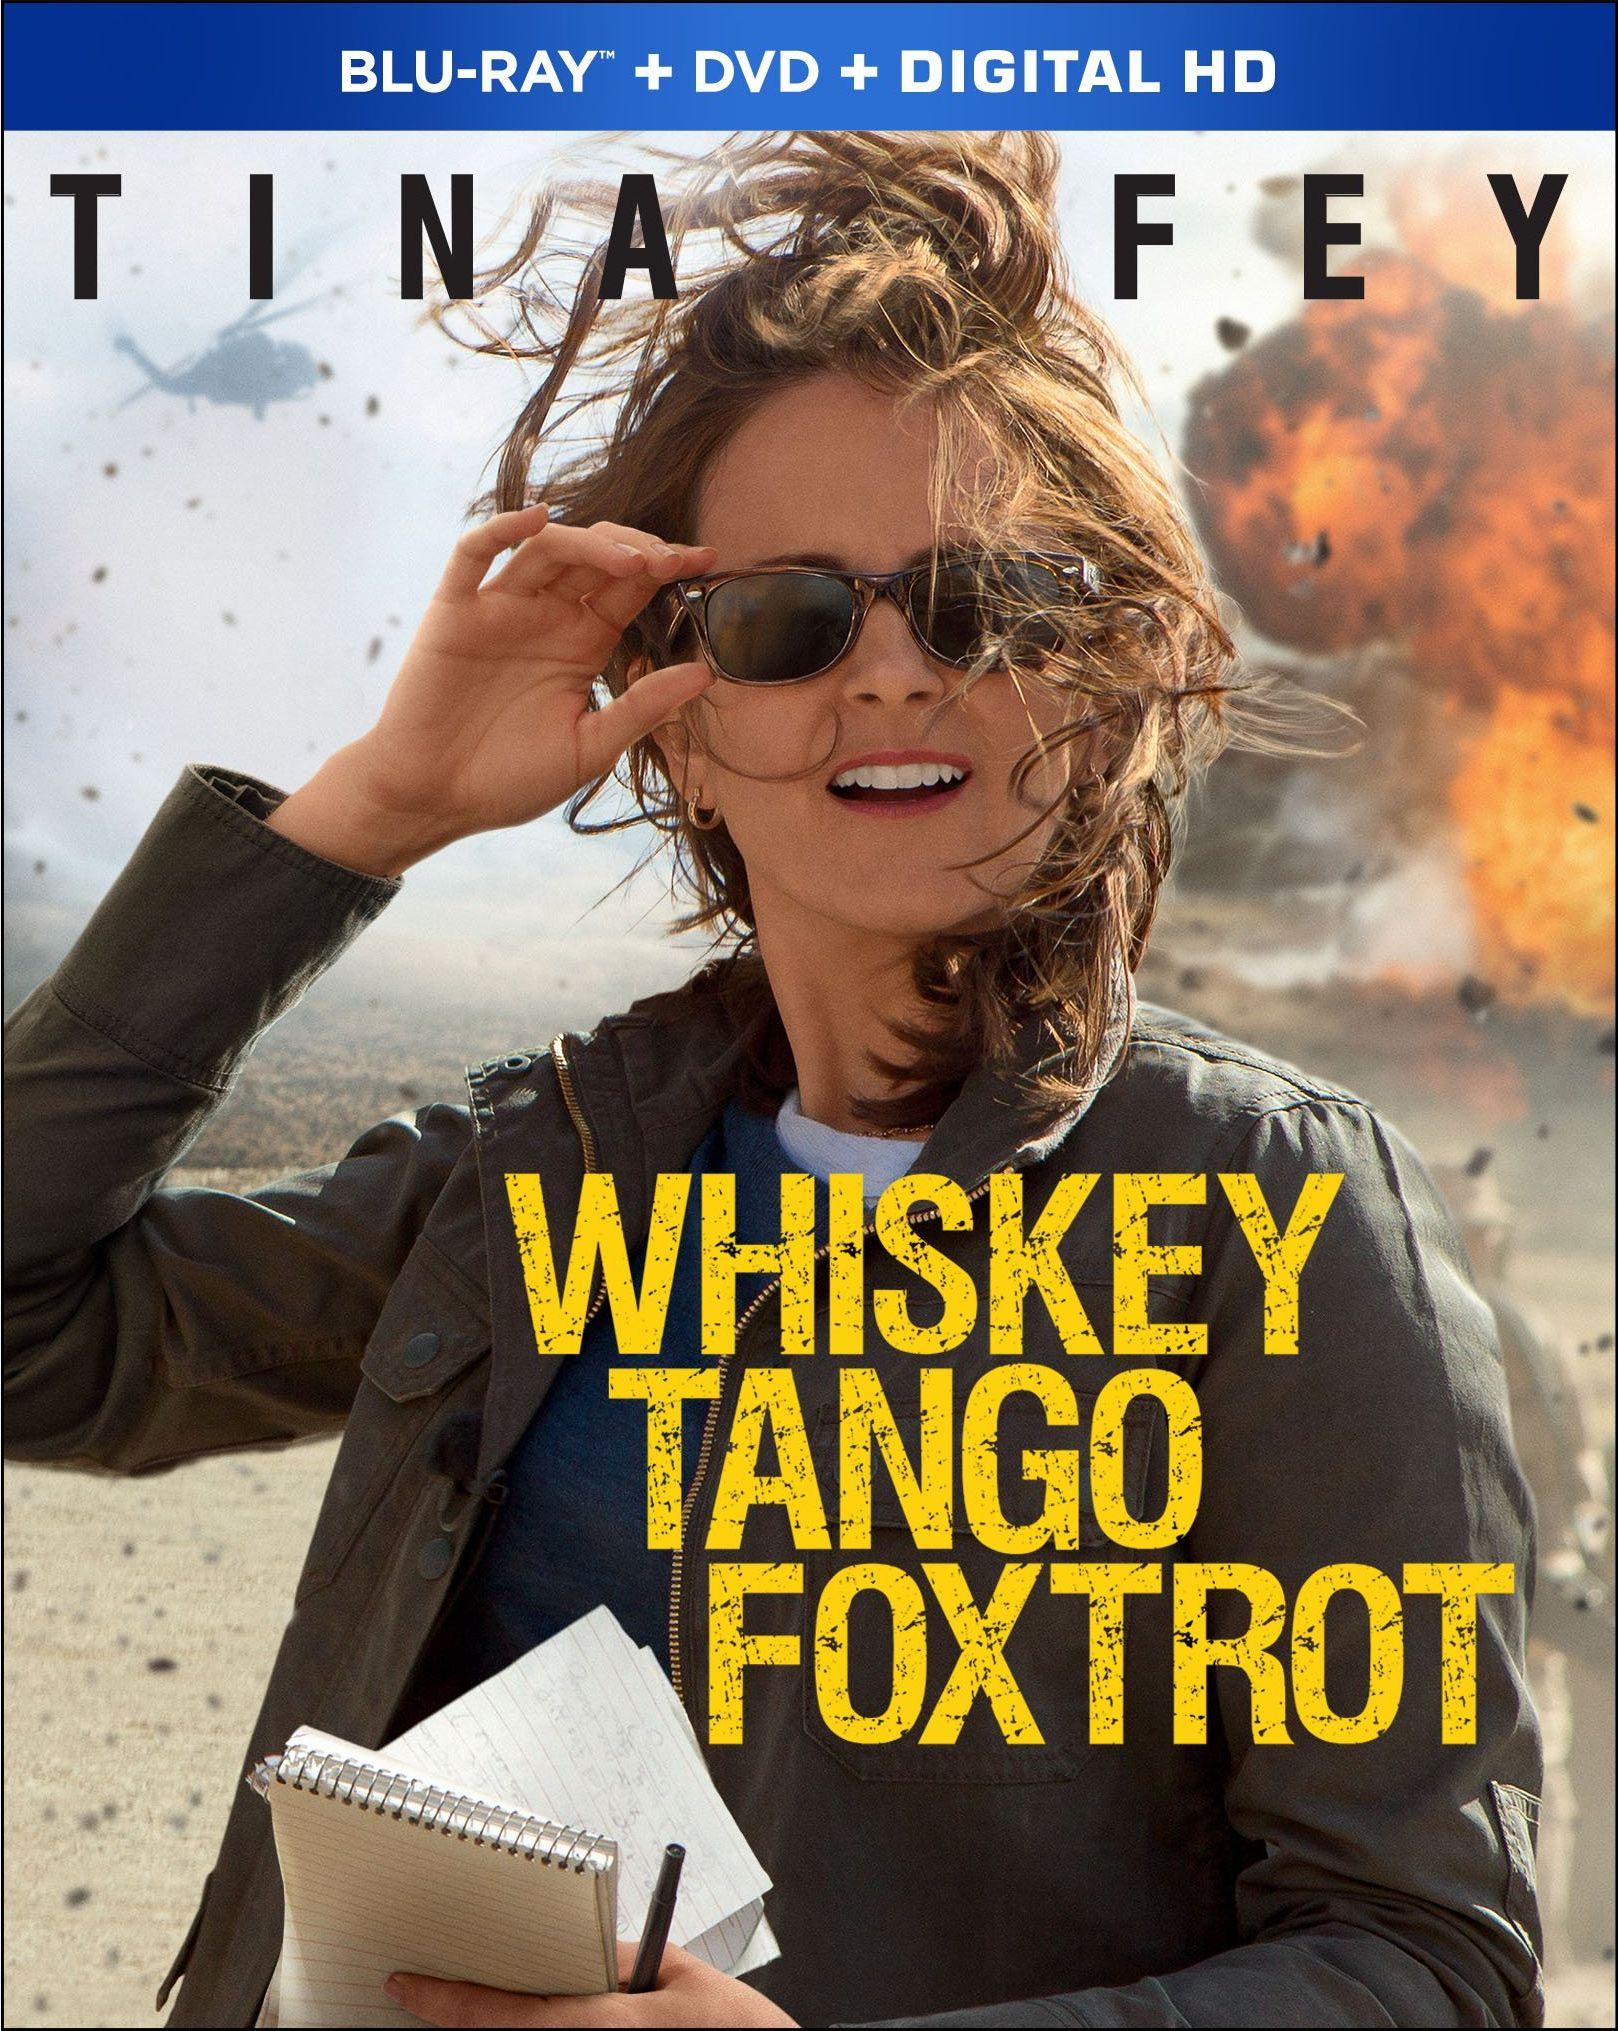 Whiskey Tango Foxtrot(2016) poster image